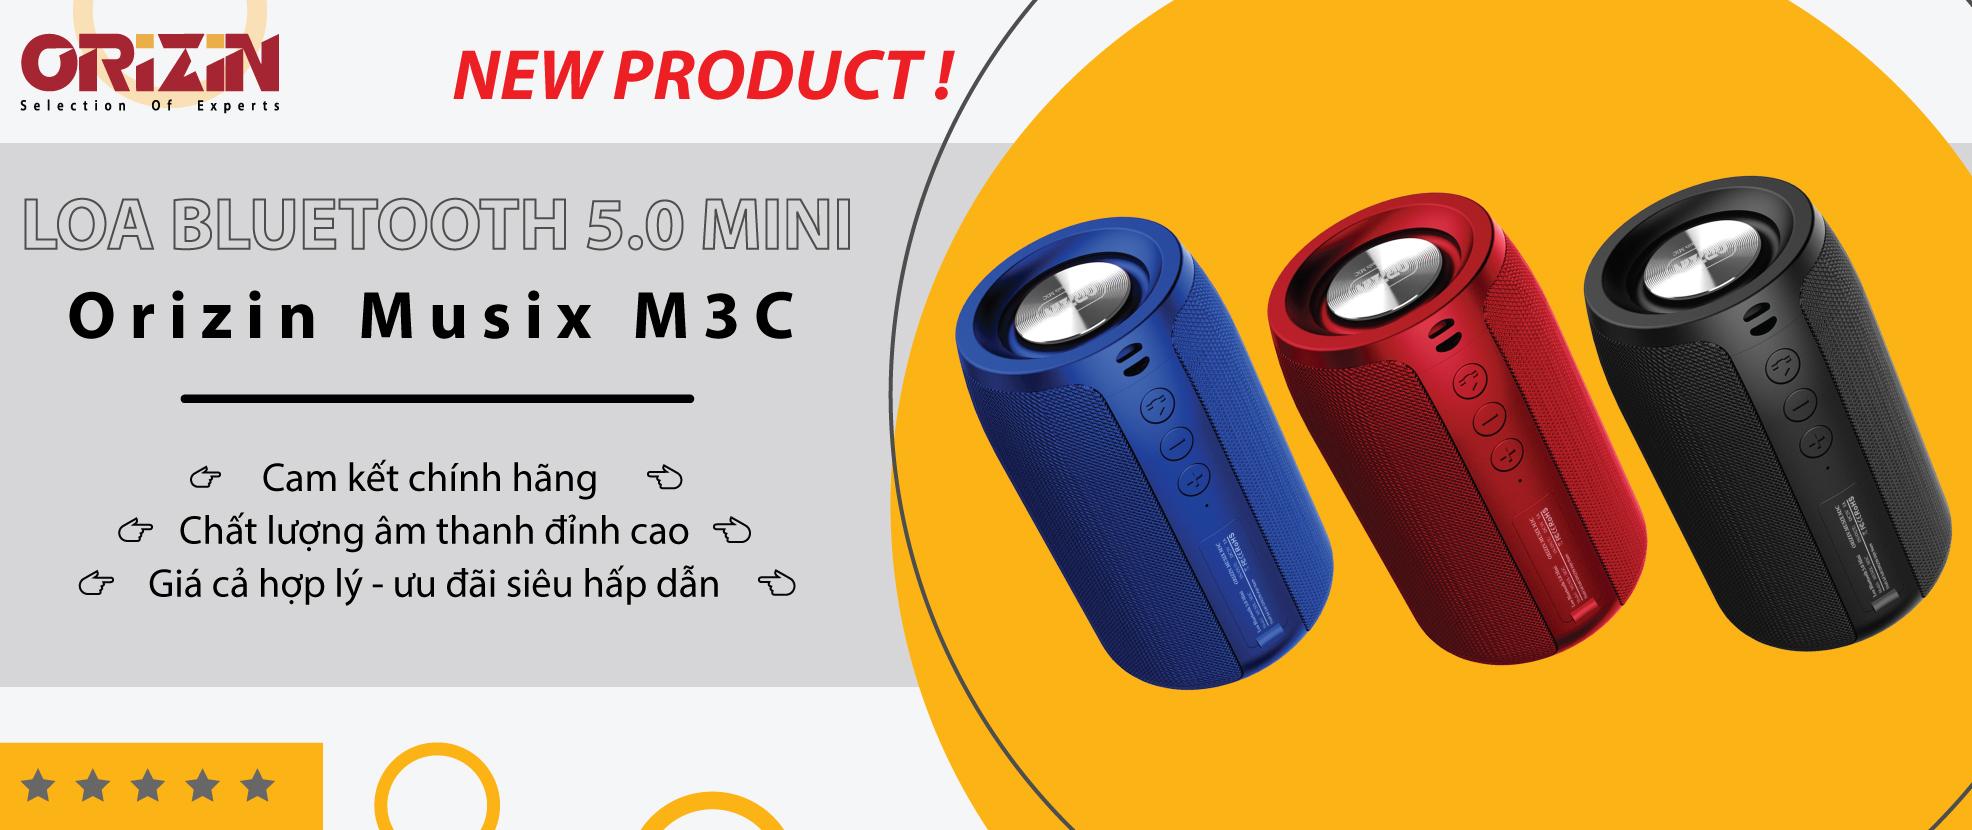 Orizin Music Box M3c